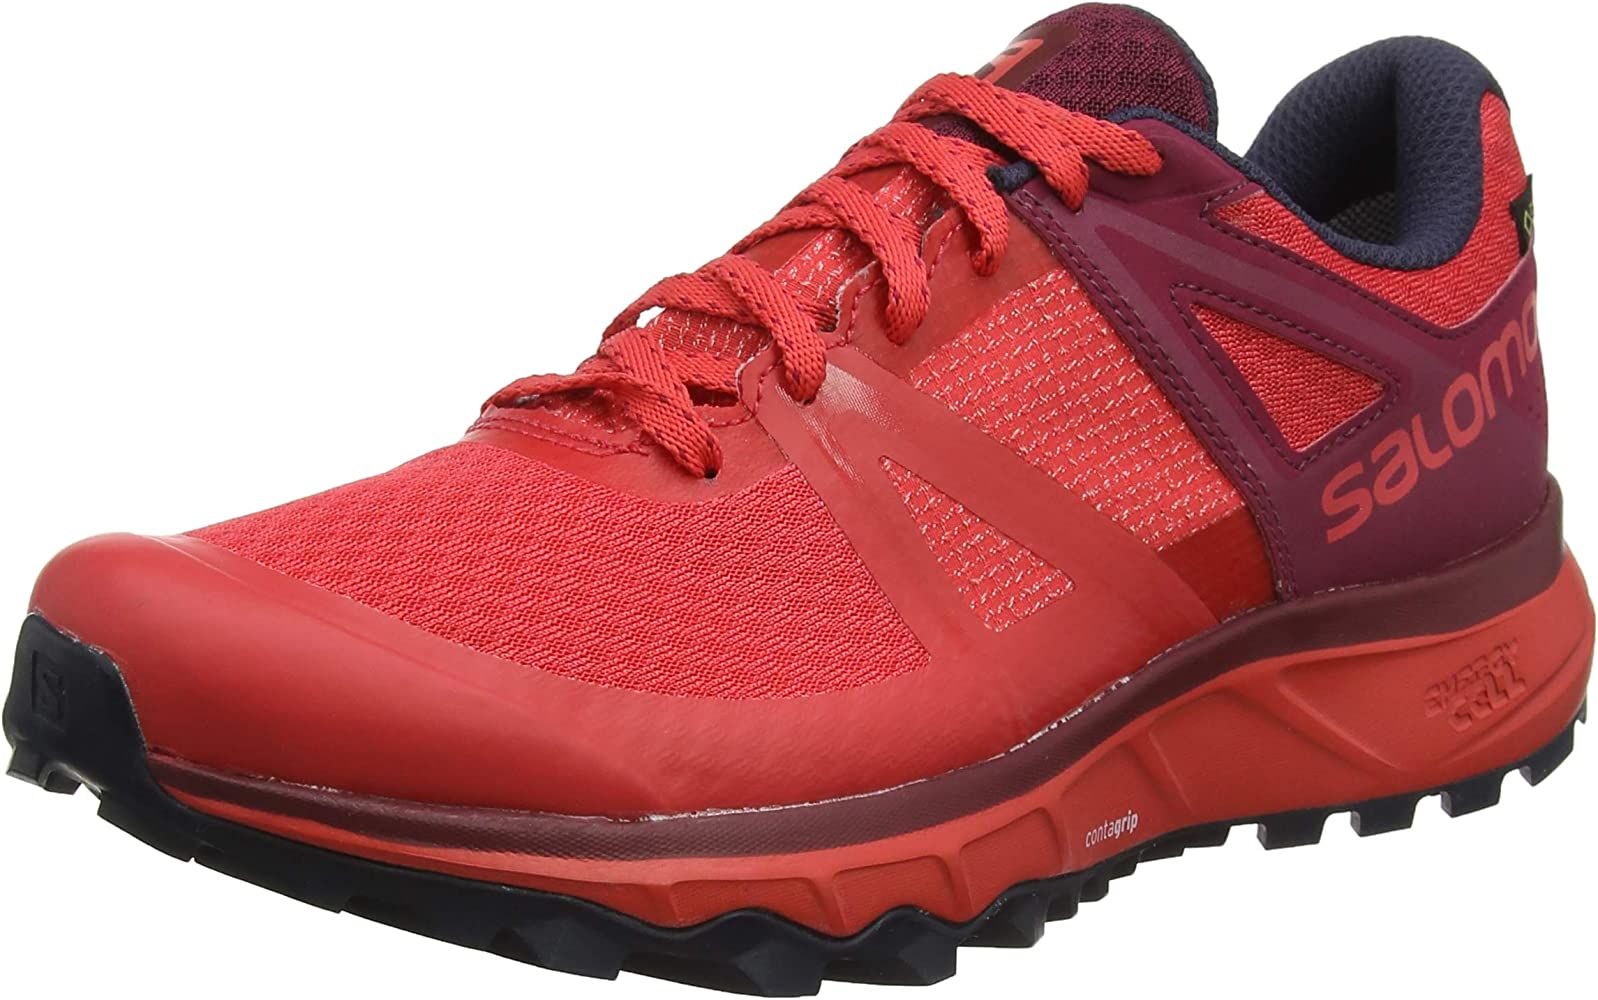 acheter en ligne a41fc 538f9 Salomon TRAILSTER GTX, Chaussures de Trail Running ...